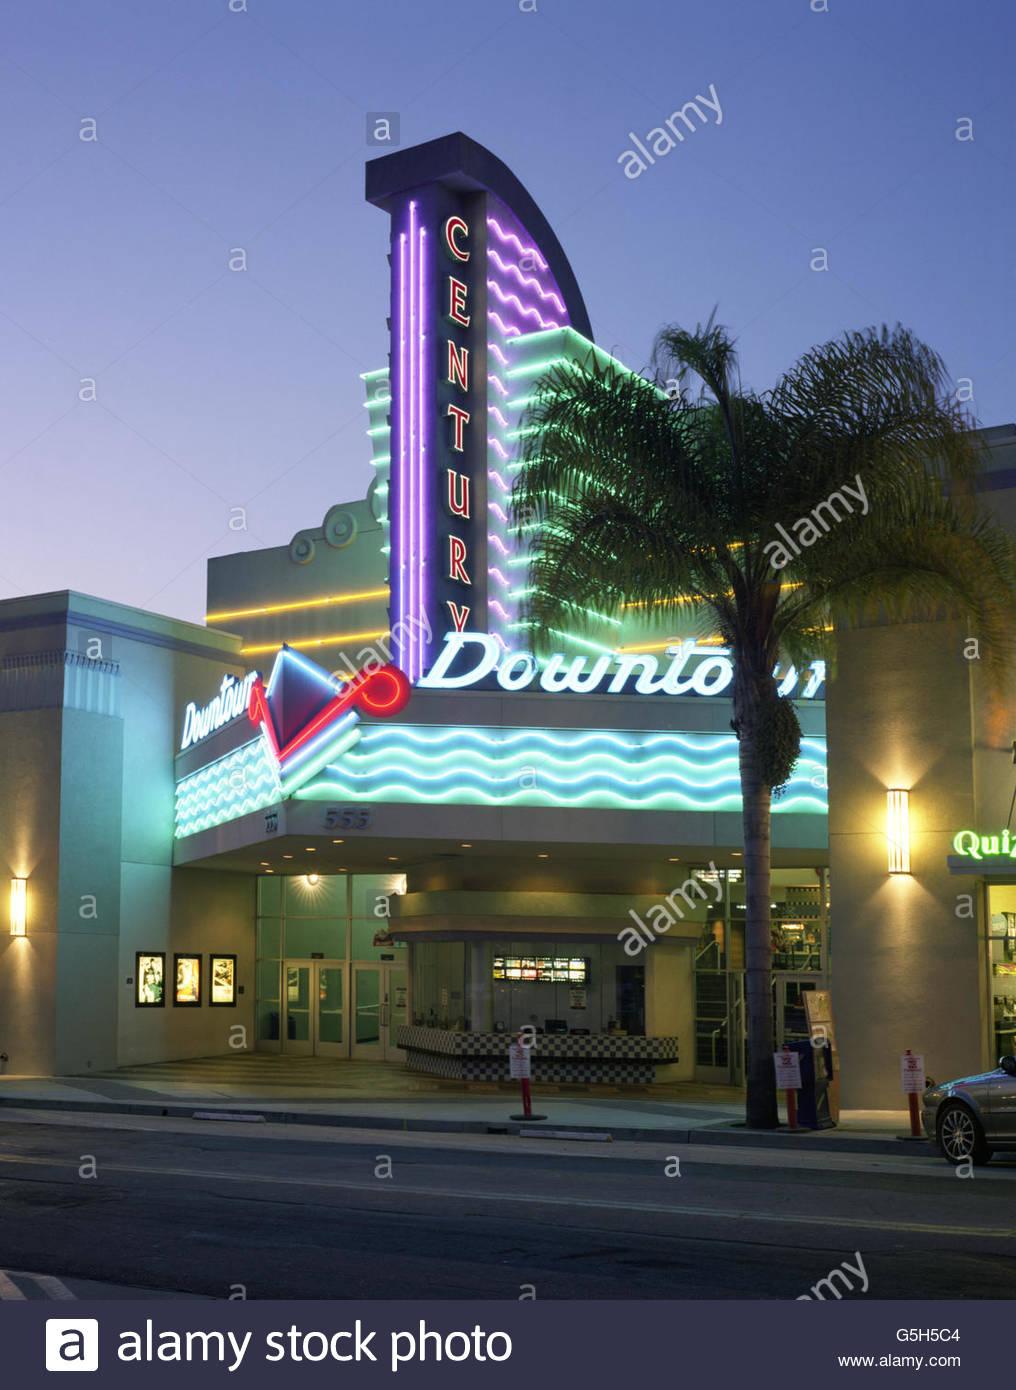 Century Cinema Stock Photos & Century Cinema Stock Images - Alamy